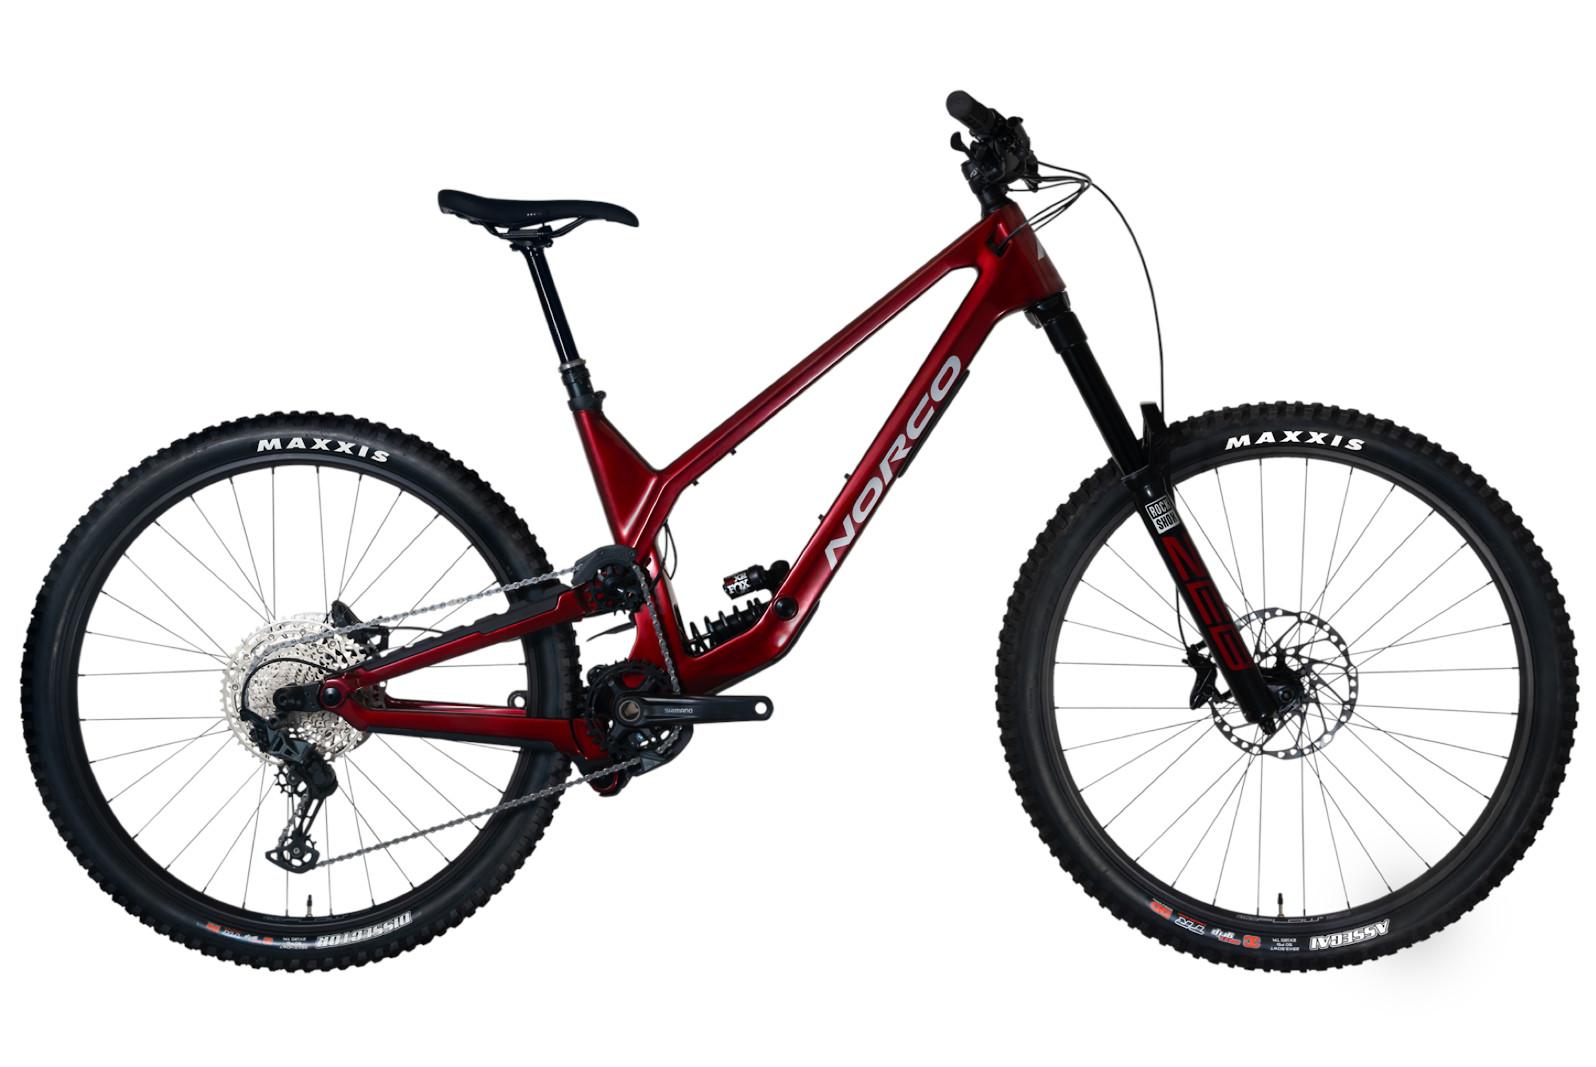 2022 Range C3 (Red/Silver)